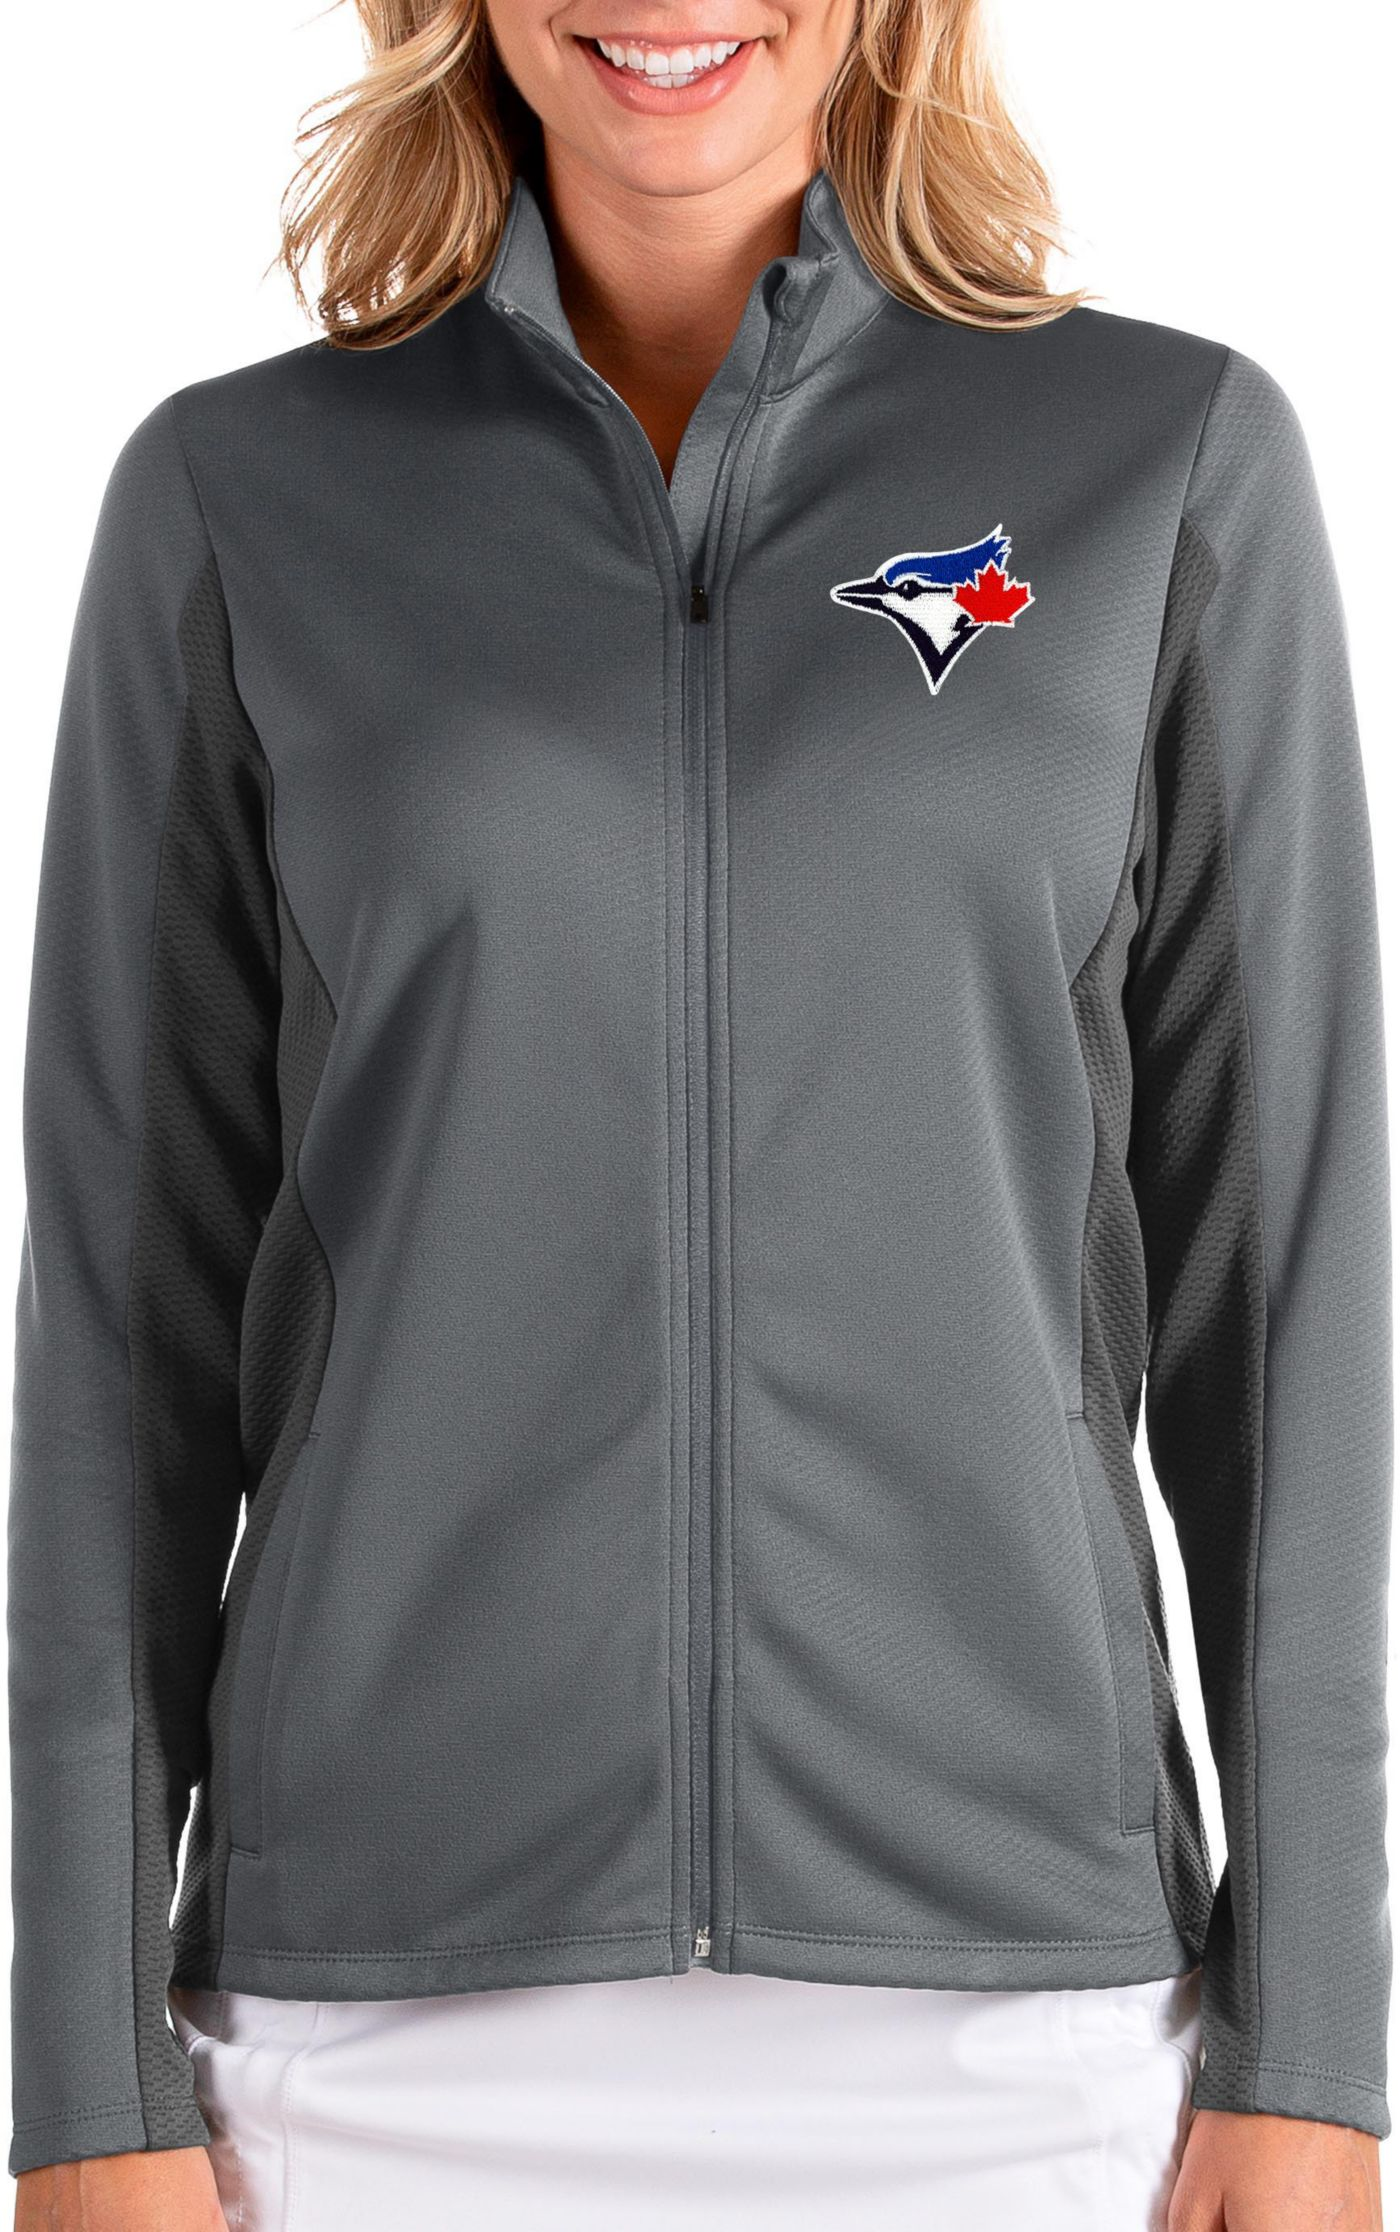 Antigua Women's Toronto Bluejays Grey Passage Full-Zip Jacket